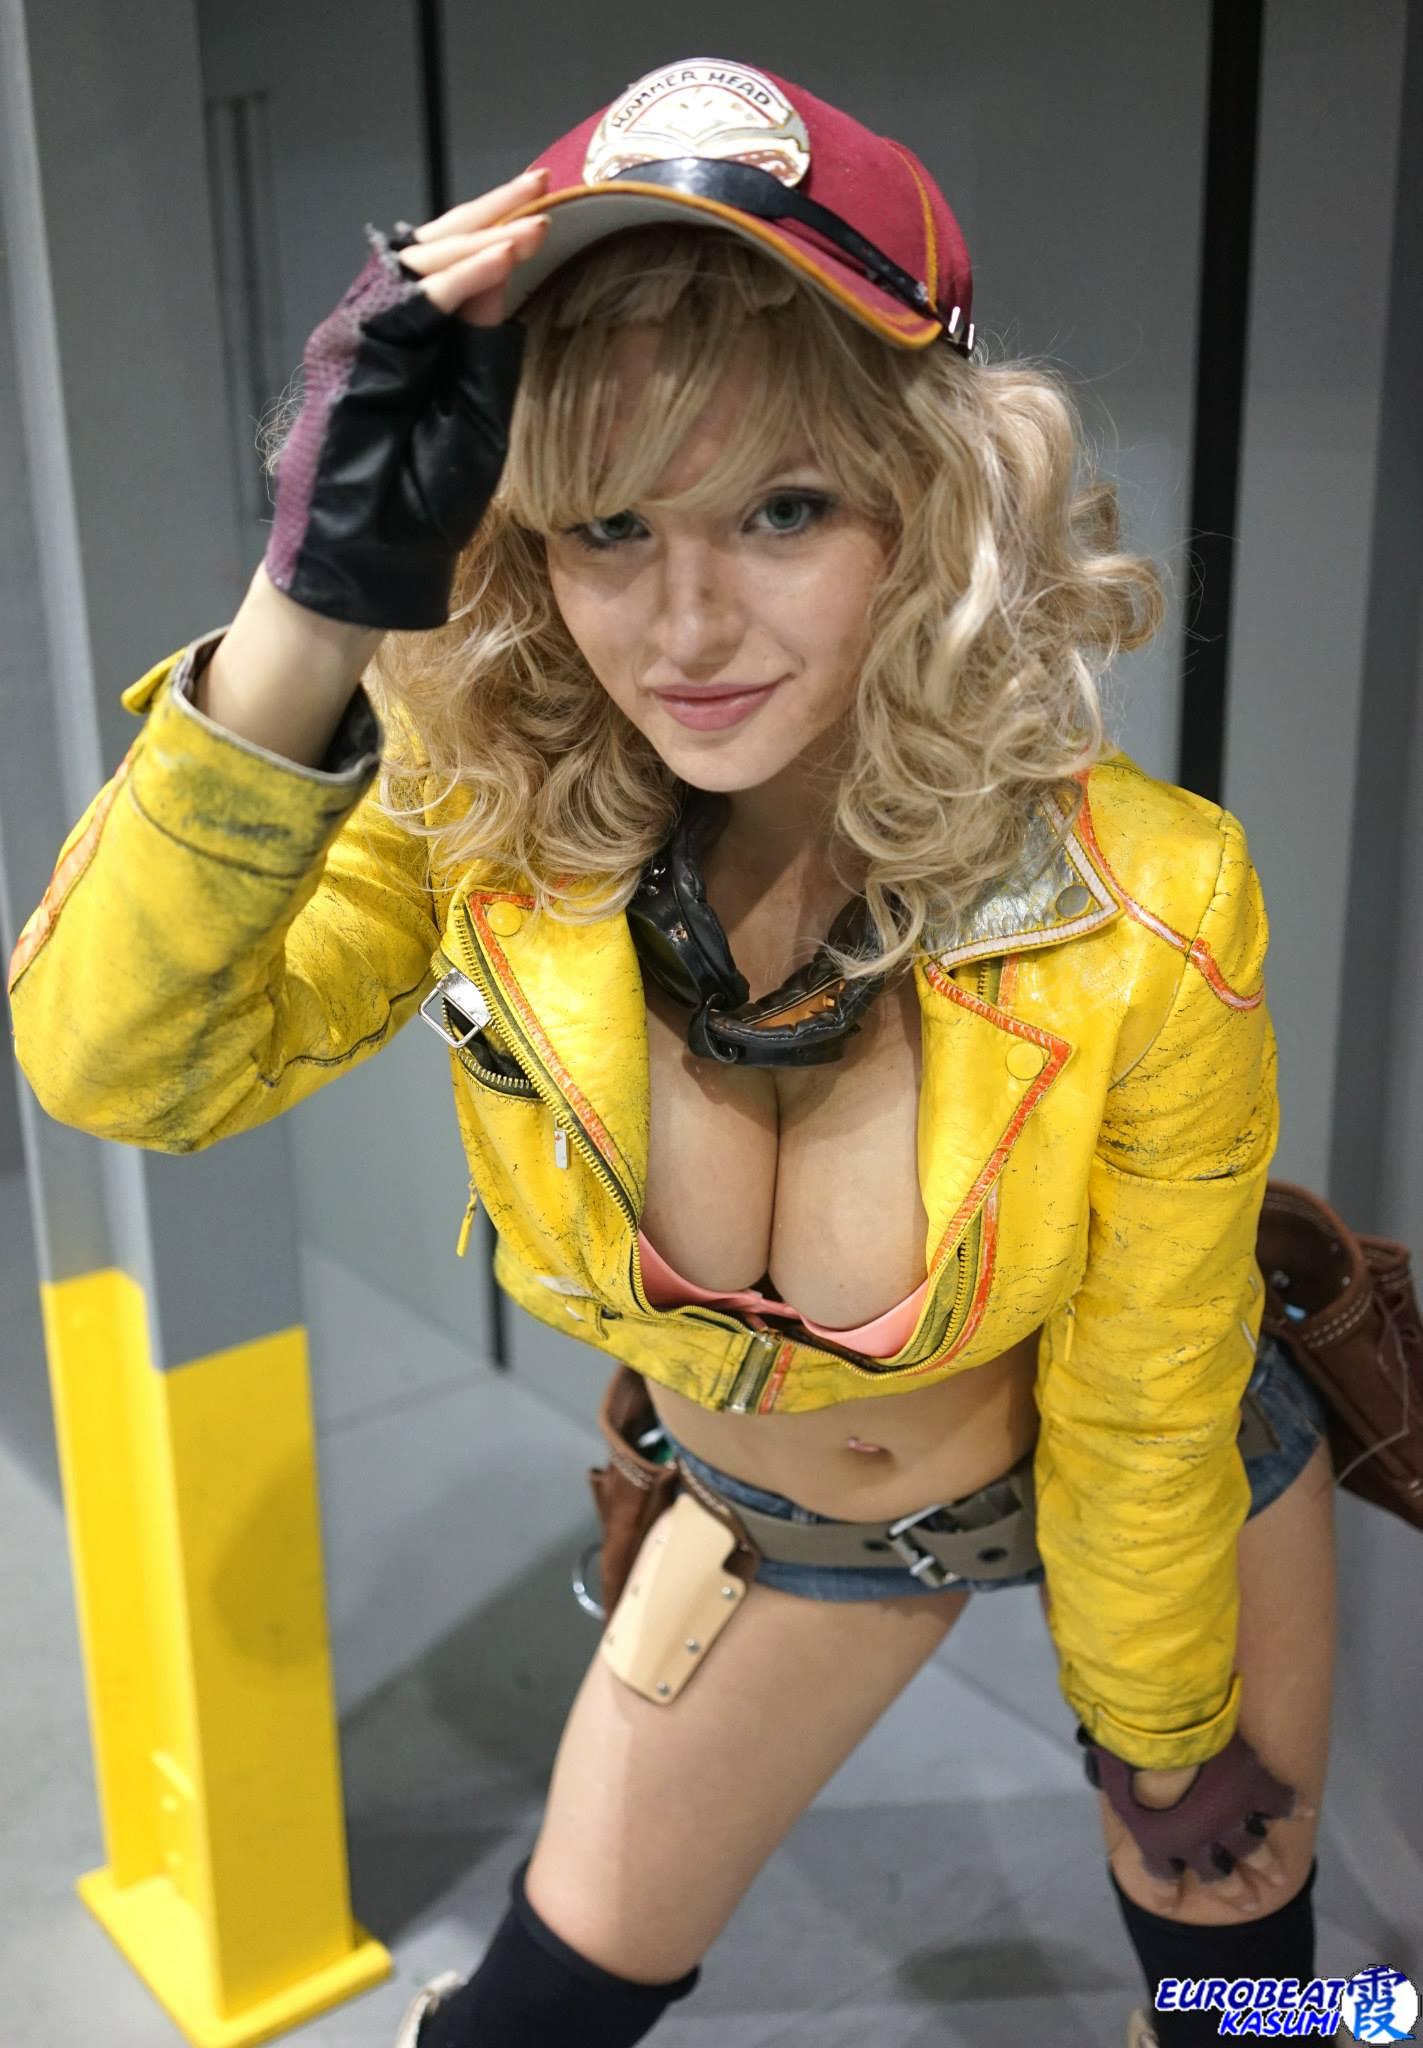 Fantasy bondage cosplay